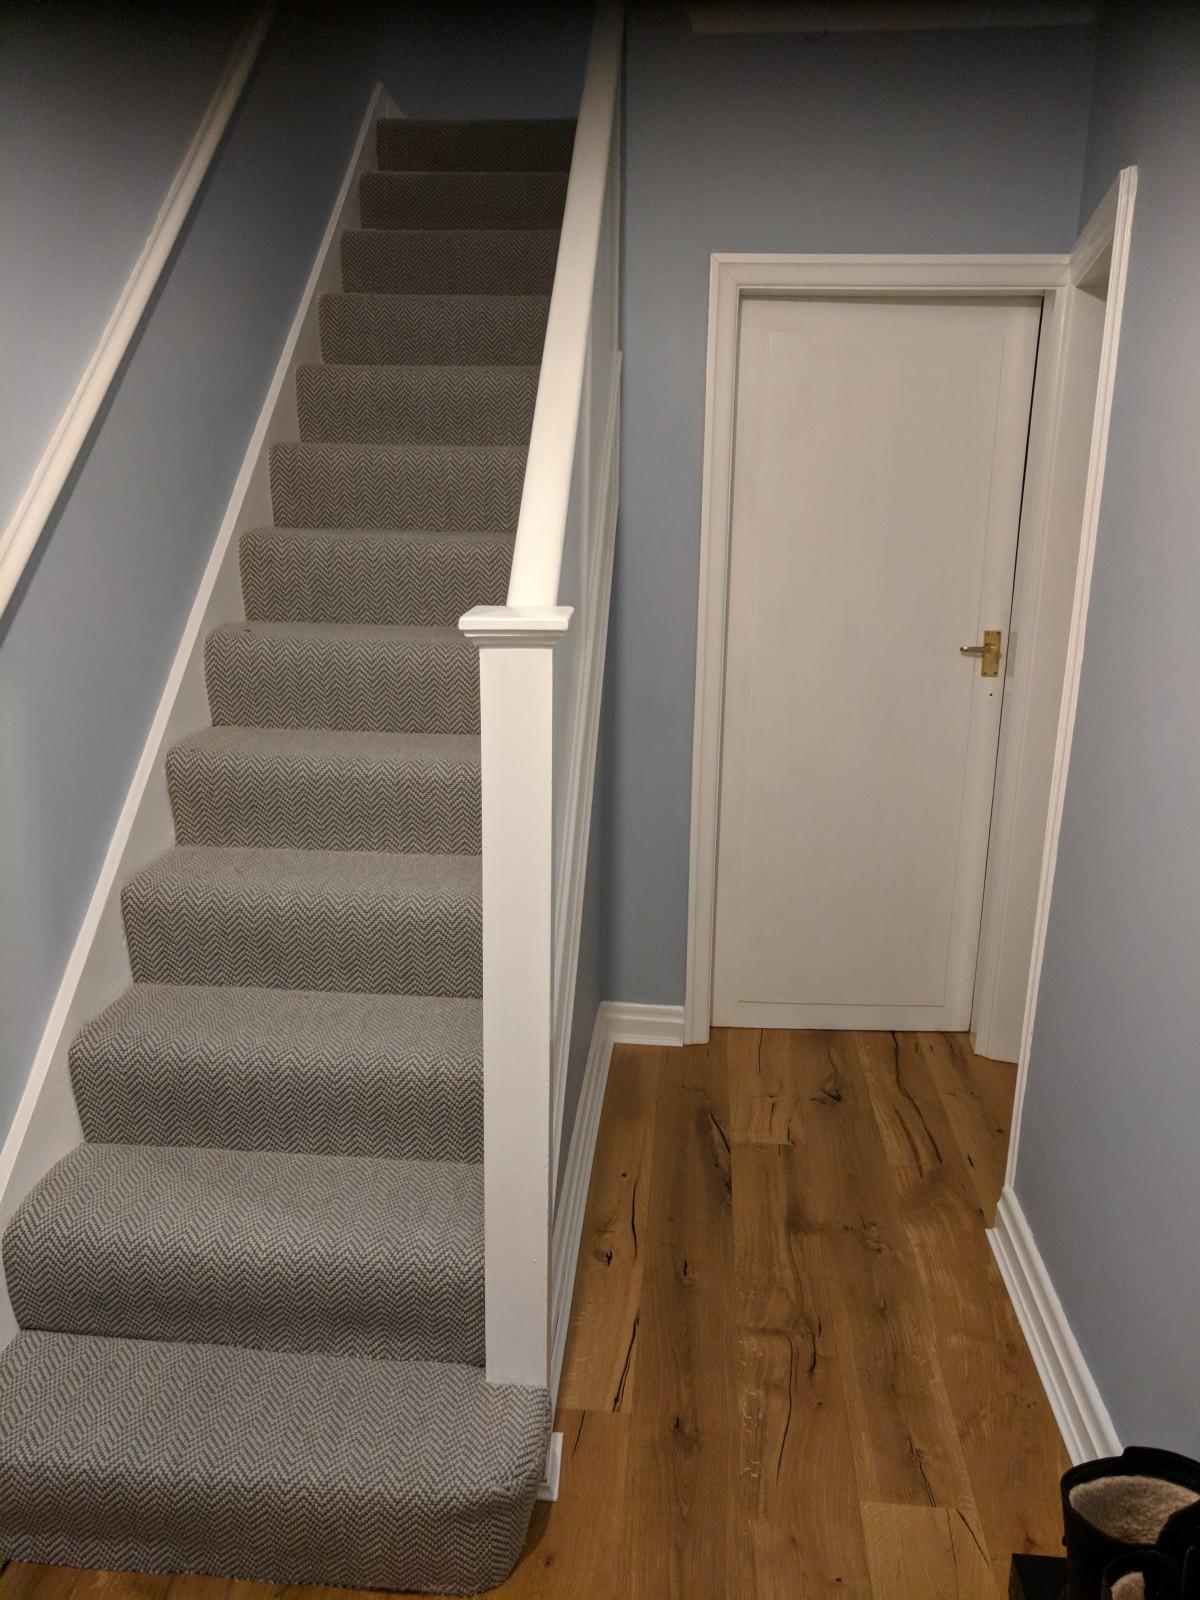 Newly laid hallway flooring